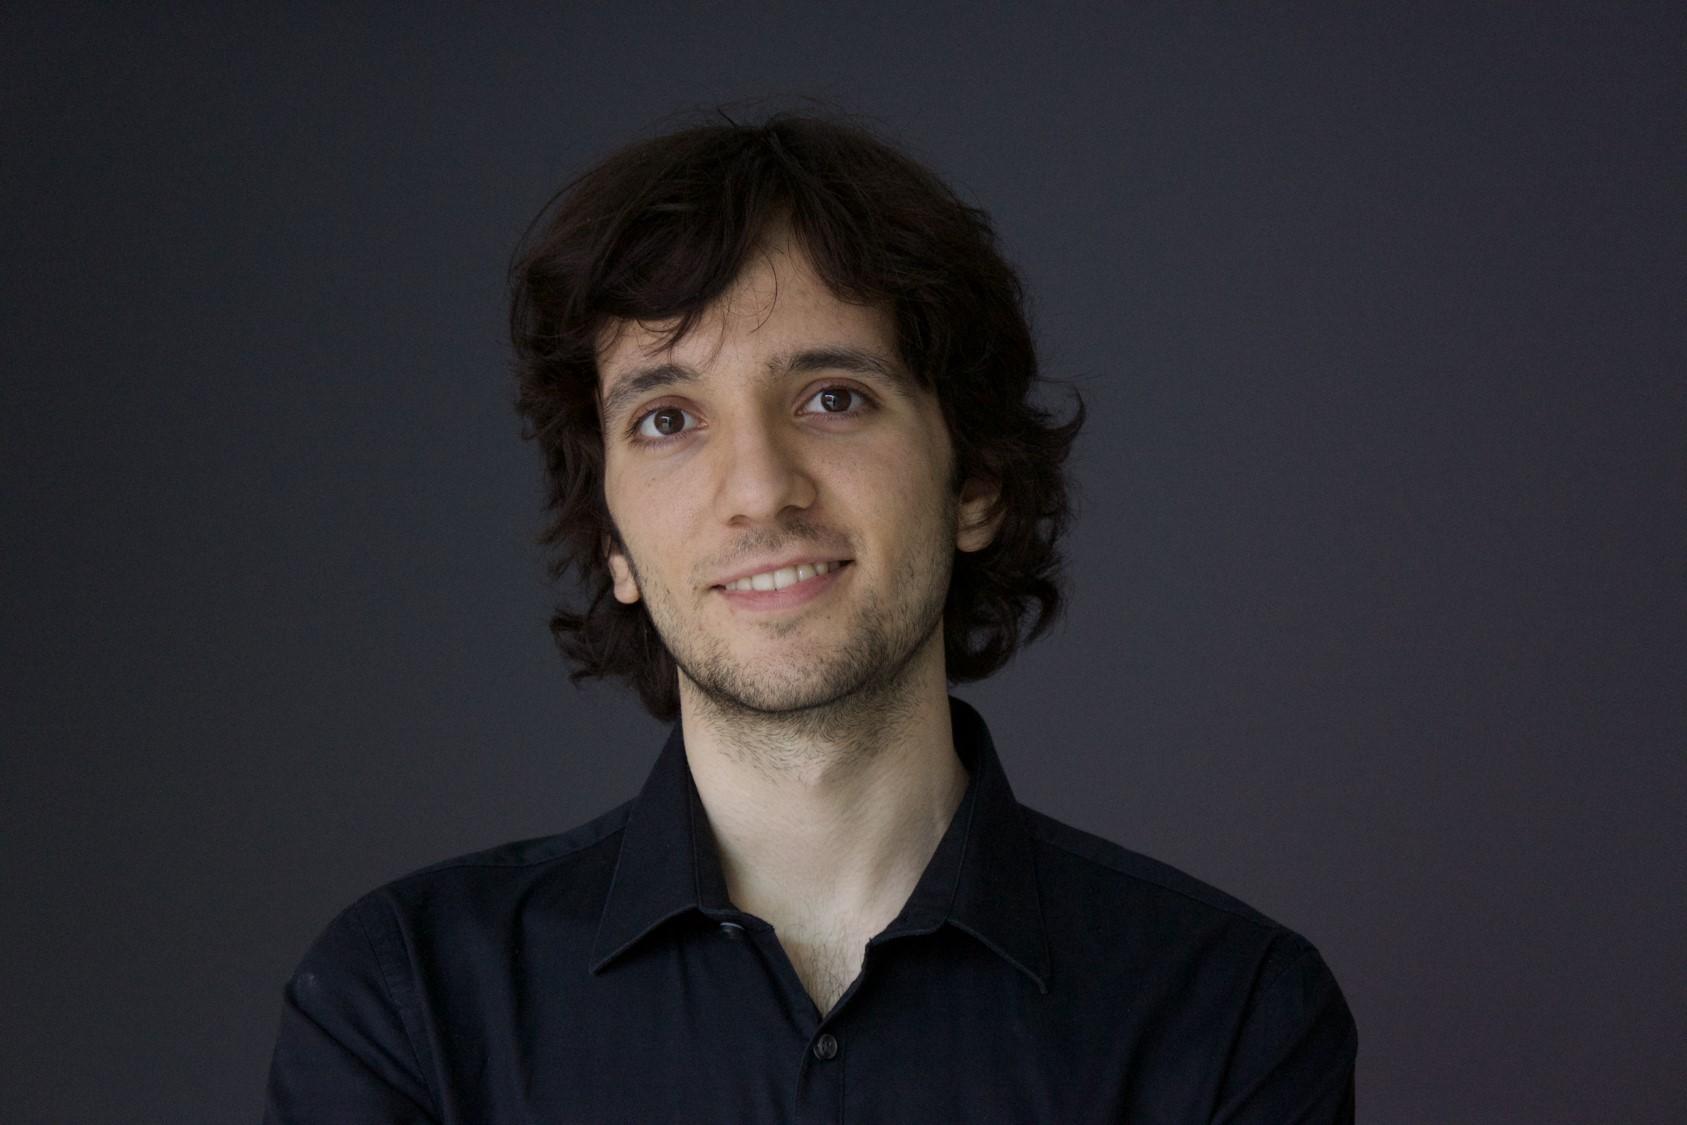 La actuación del pianista valenciano Jorge Tabarés cierra el ciclo Concerts a la Fundació